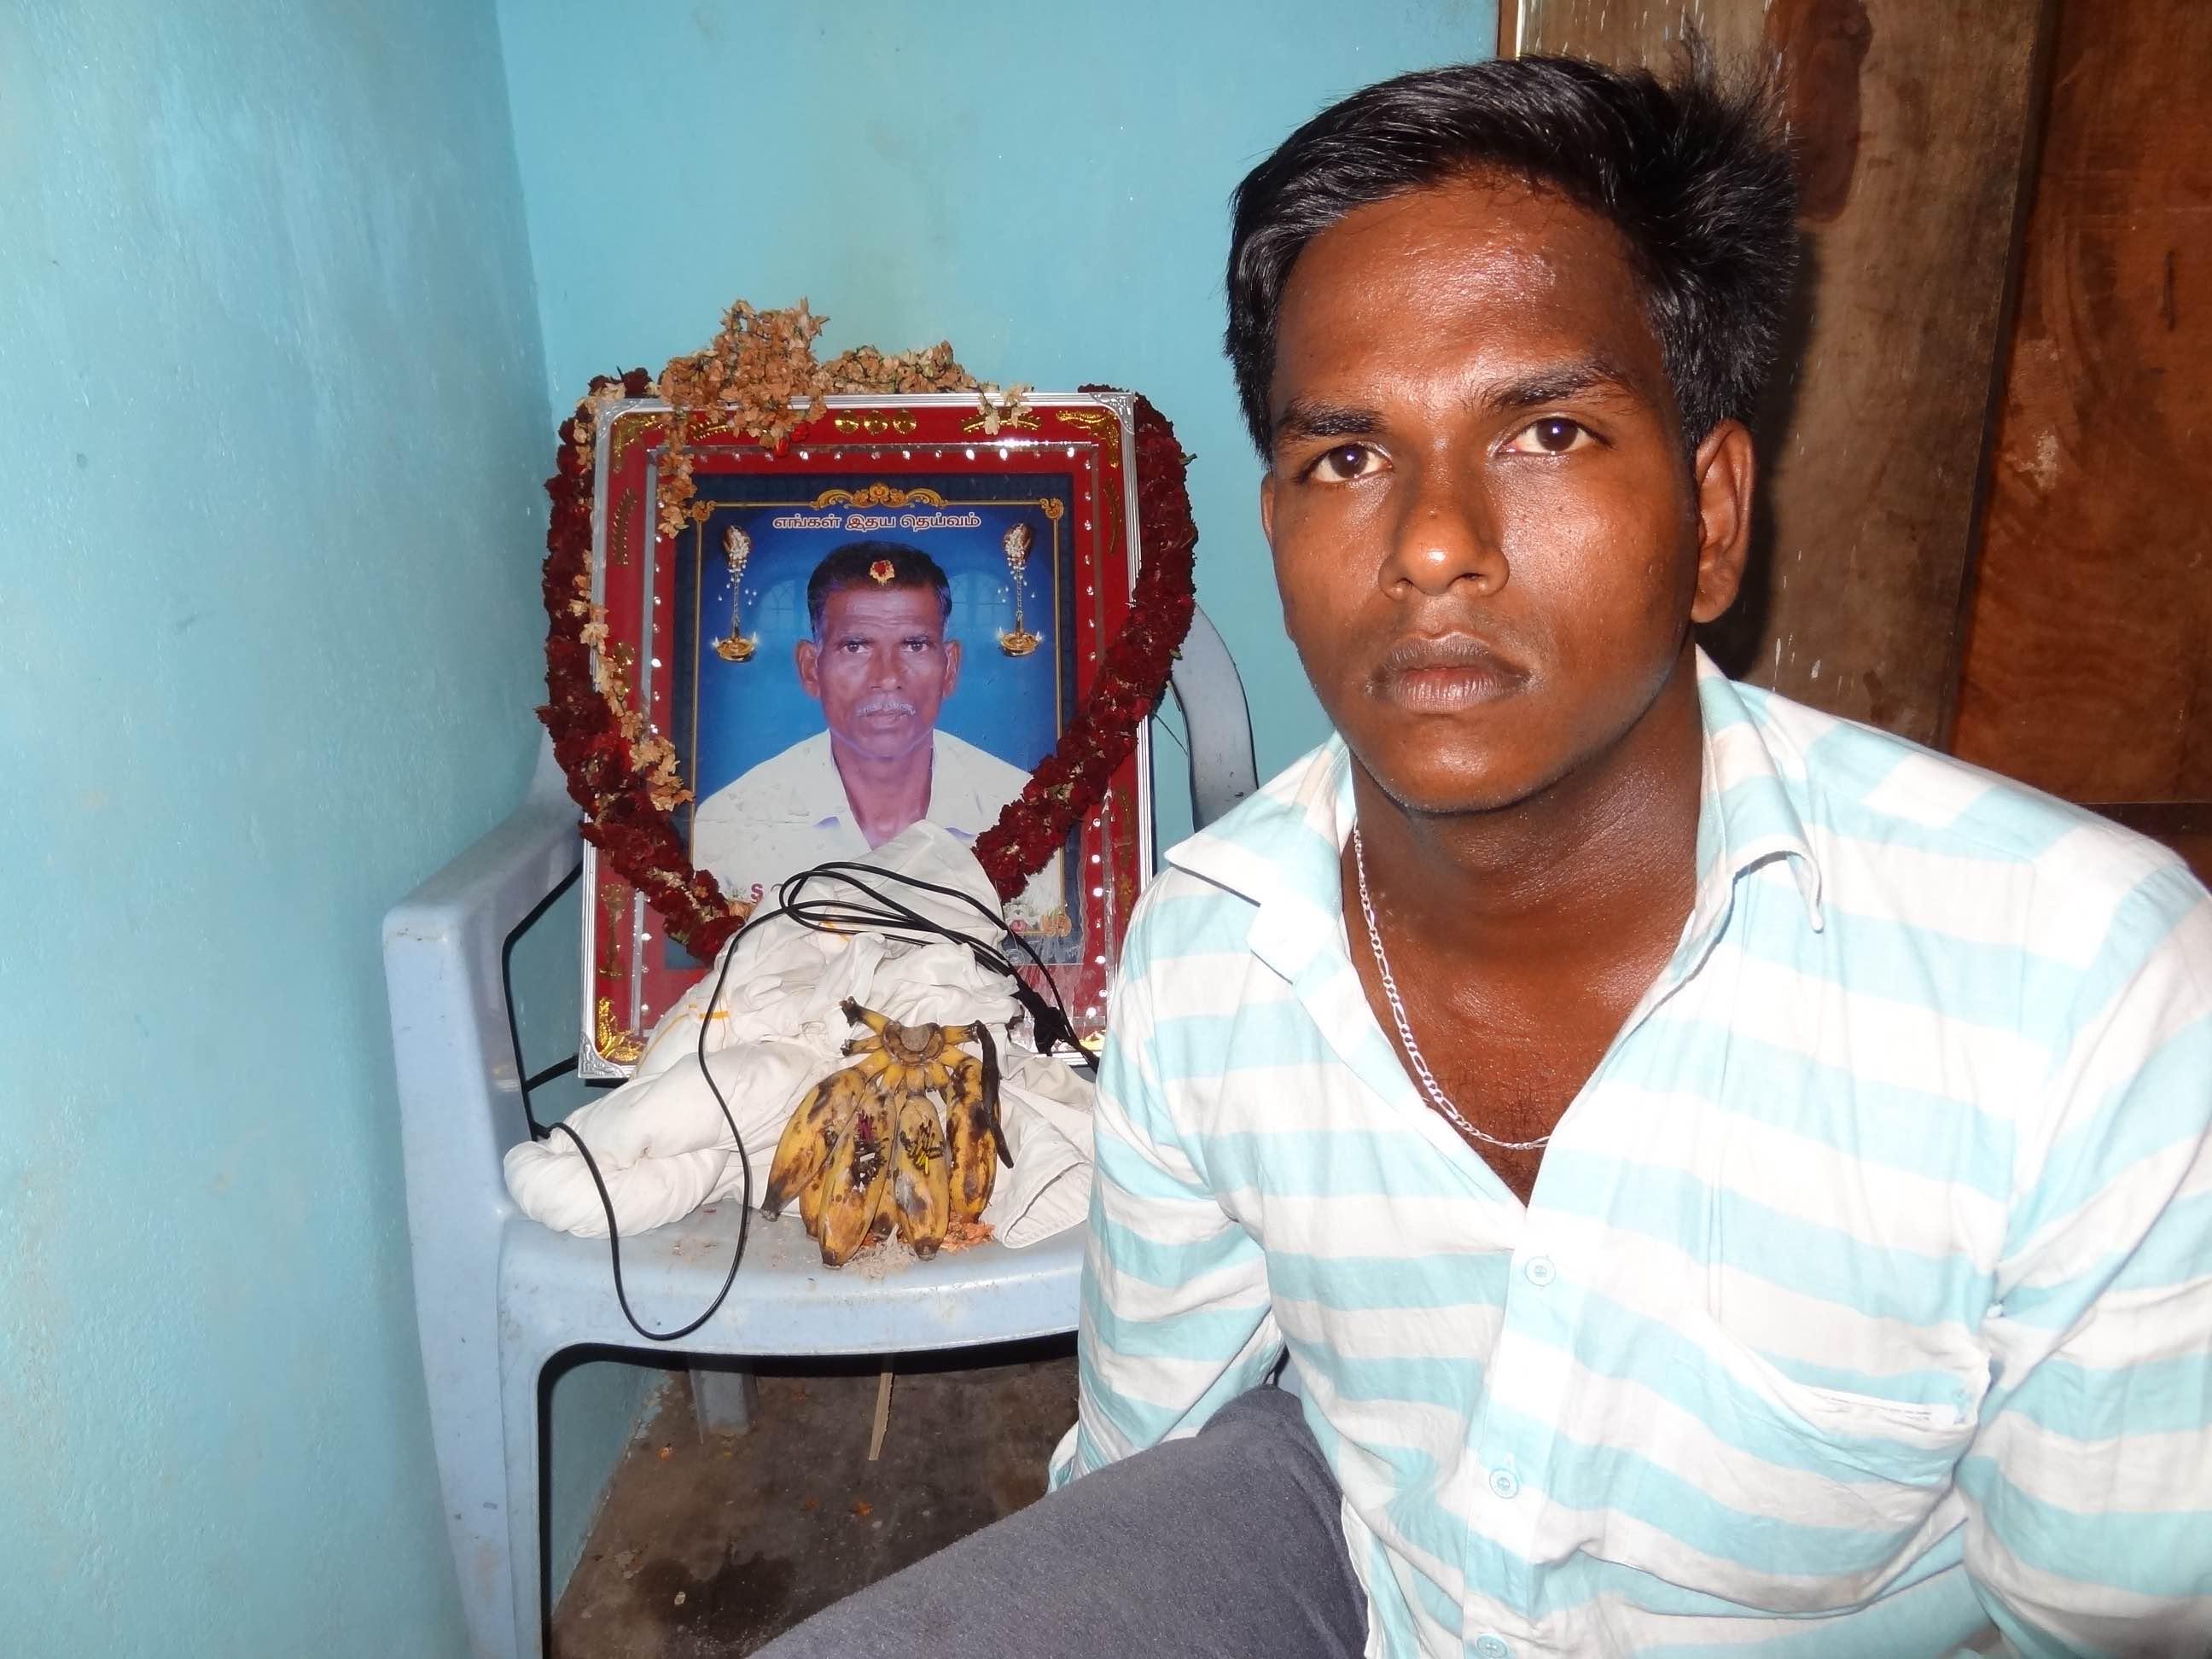 Karti with his father's photograph at their home. Credit: Jaideep Hardikar